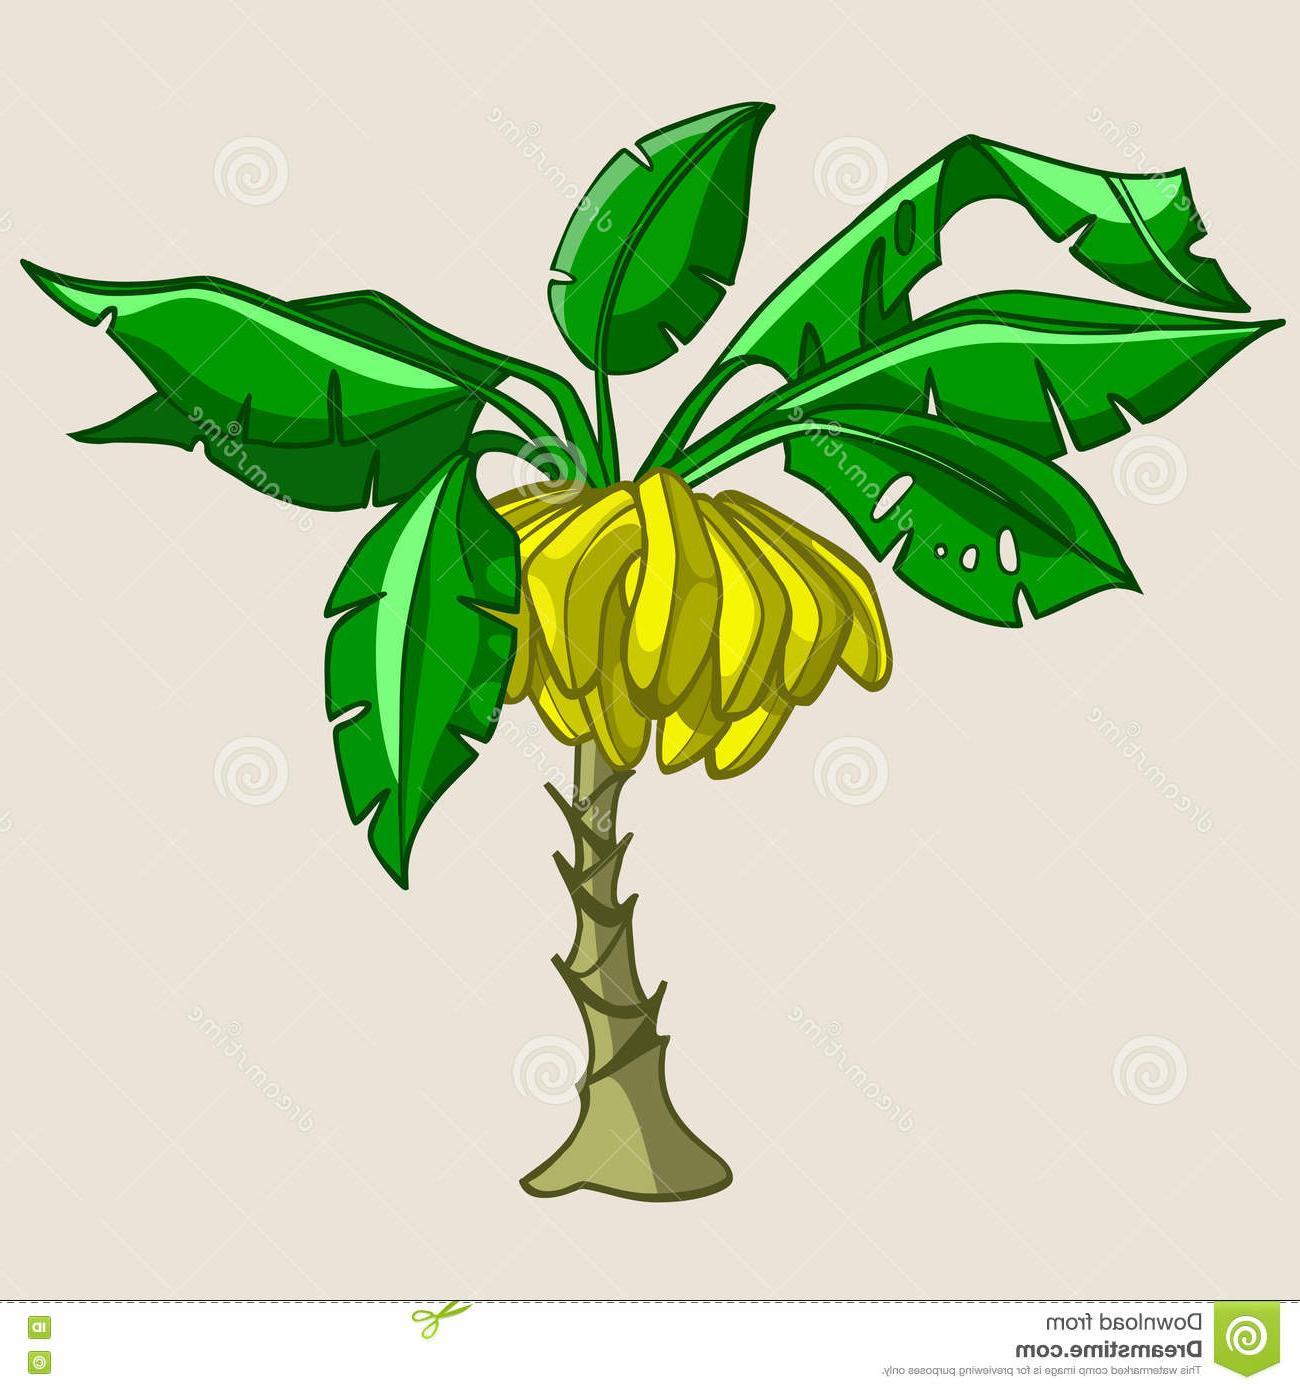 Top Banana Tree Clip Art Cdr » Free Vector Art, Images, Graphics.